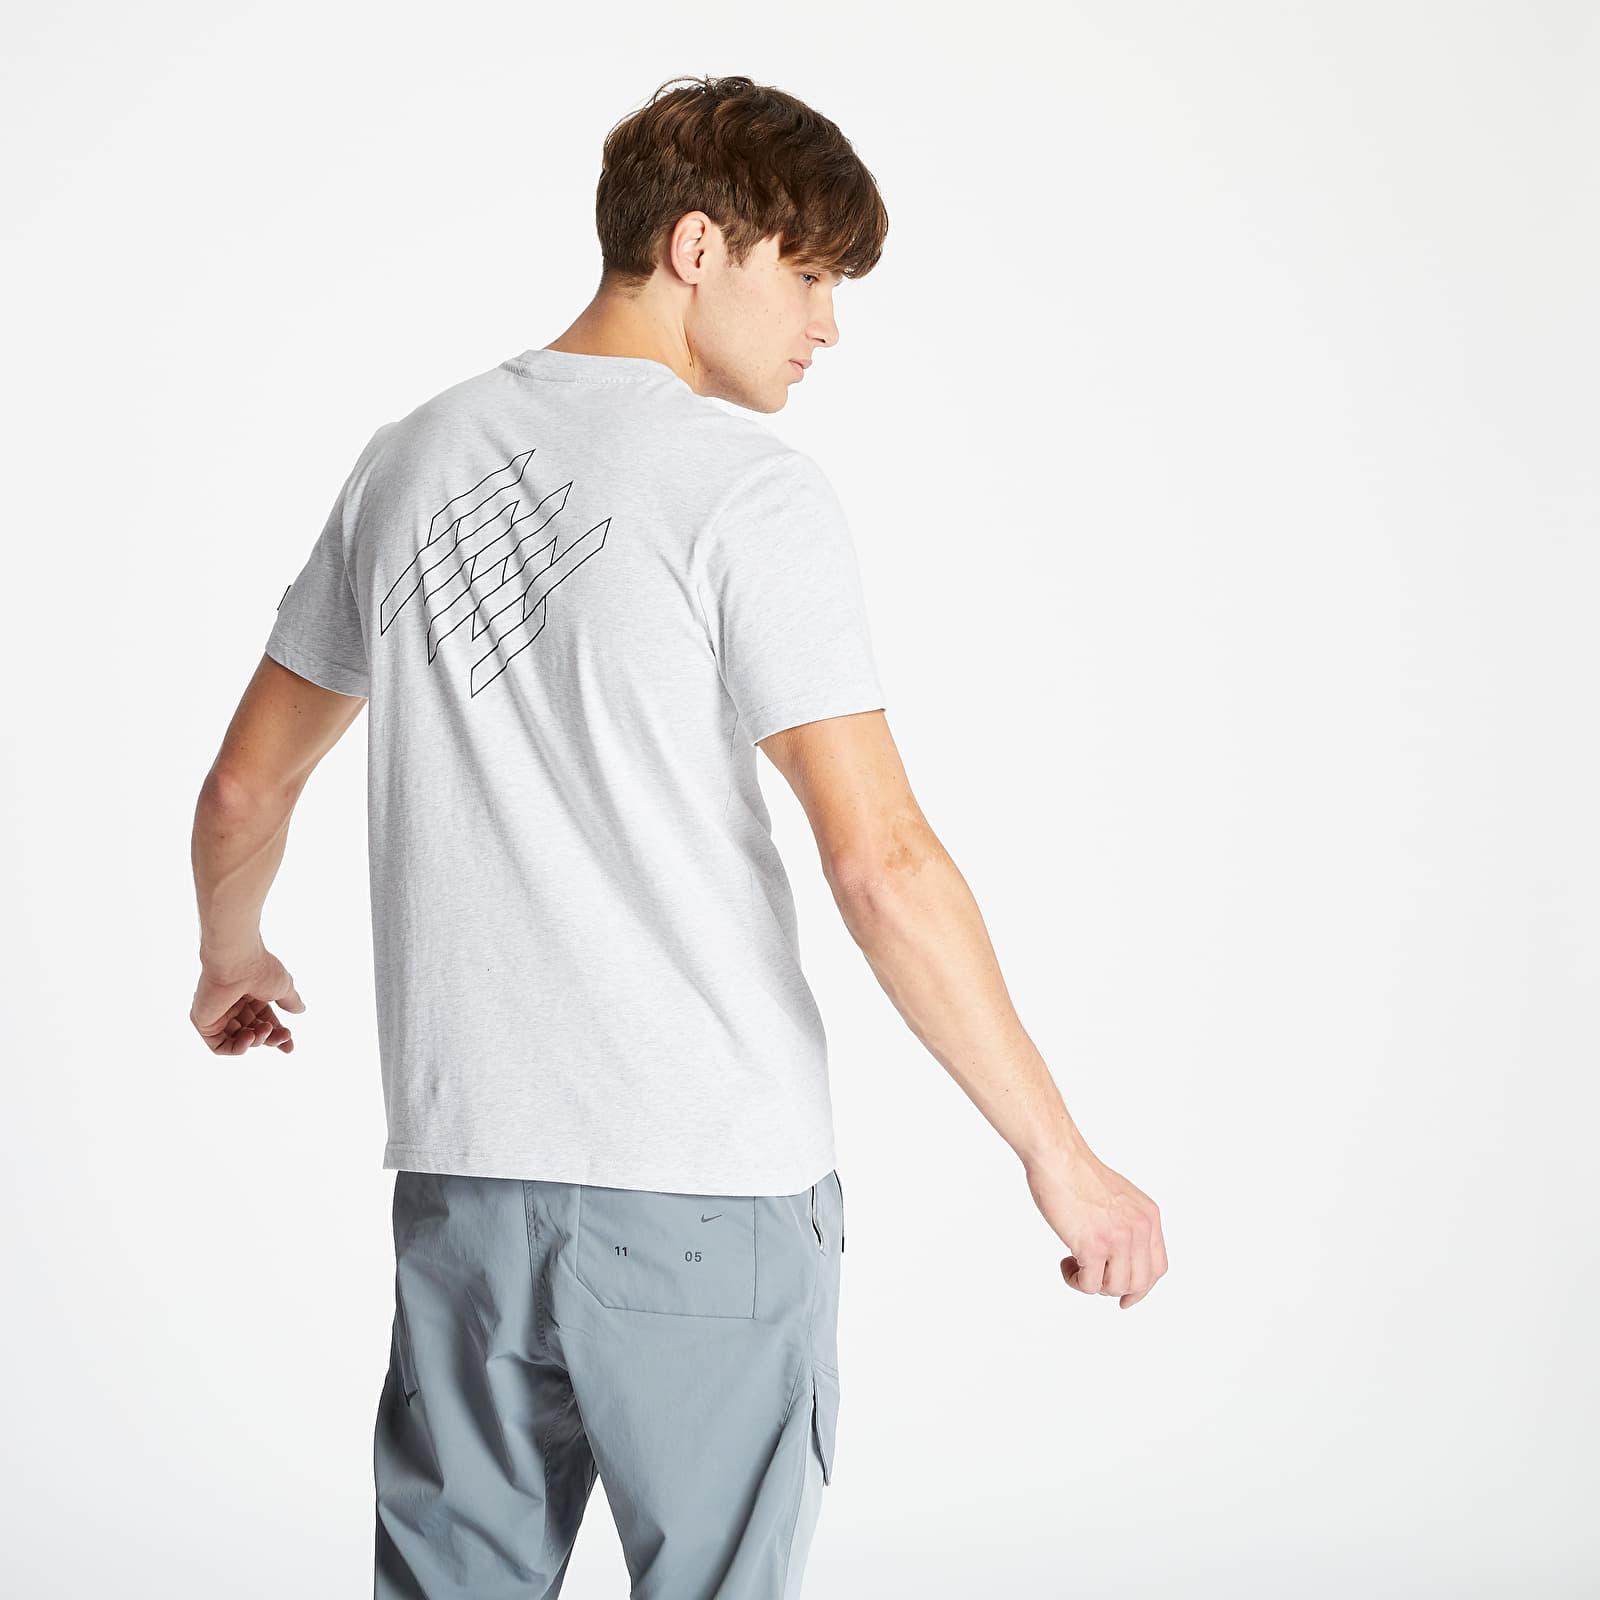 adidas SPEZIAL Tee Grey S